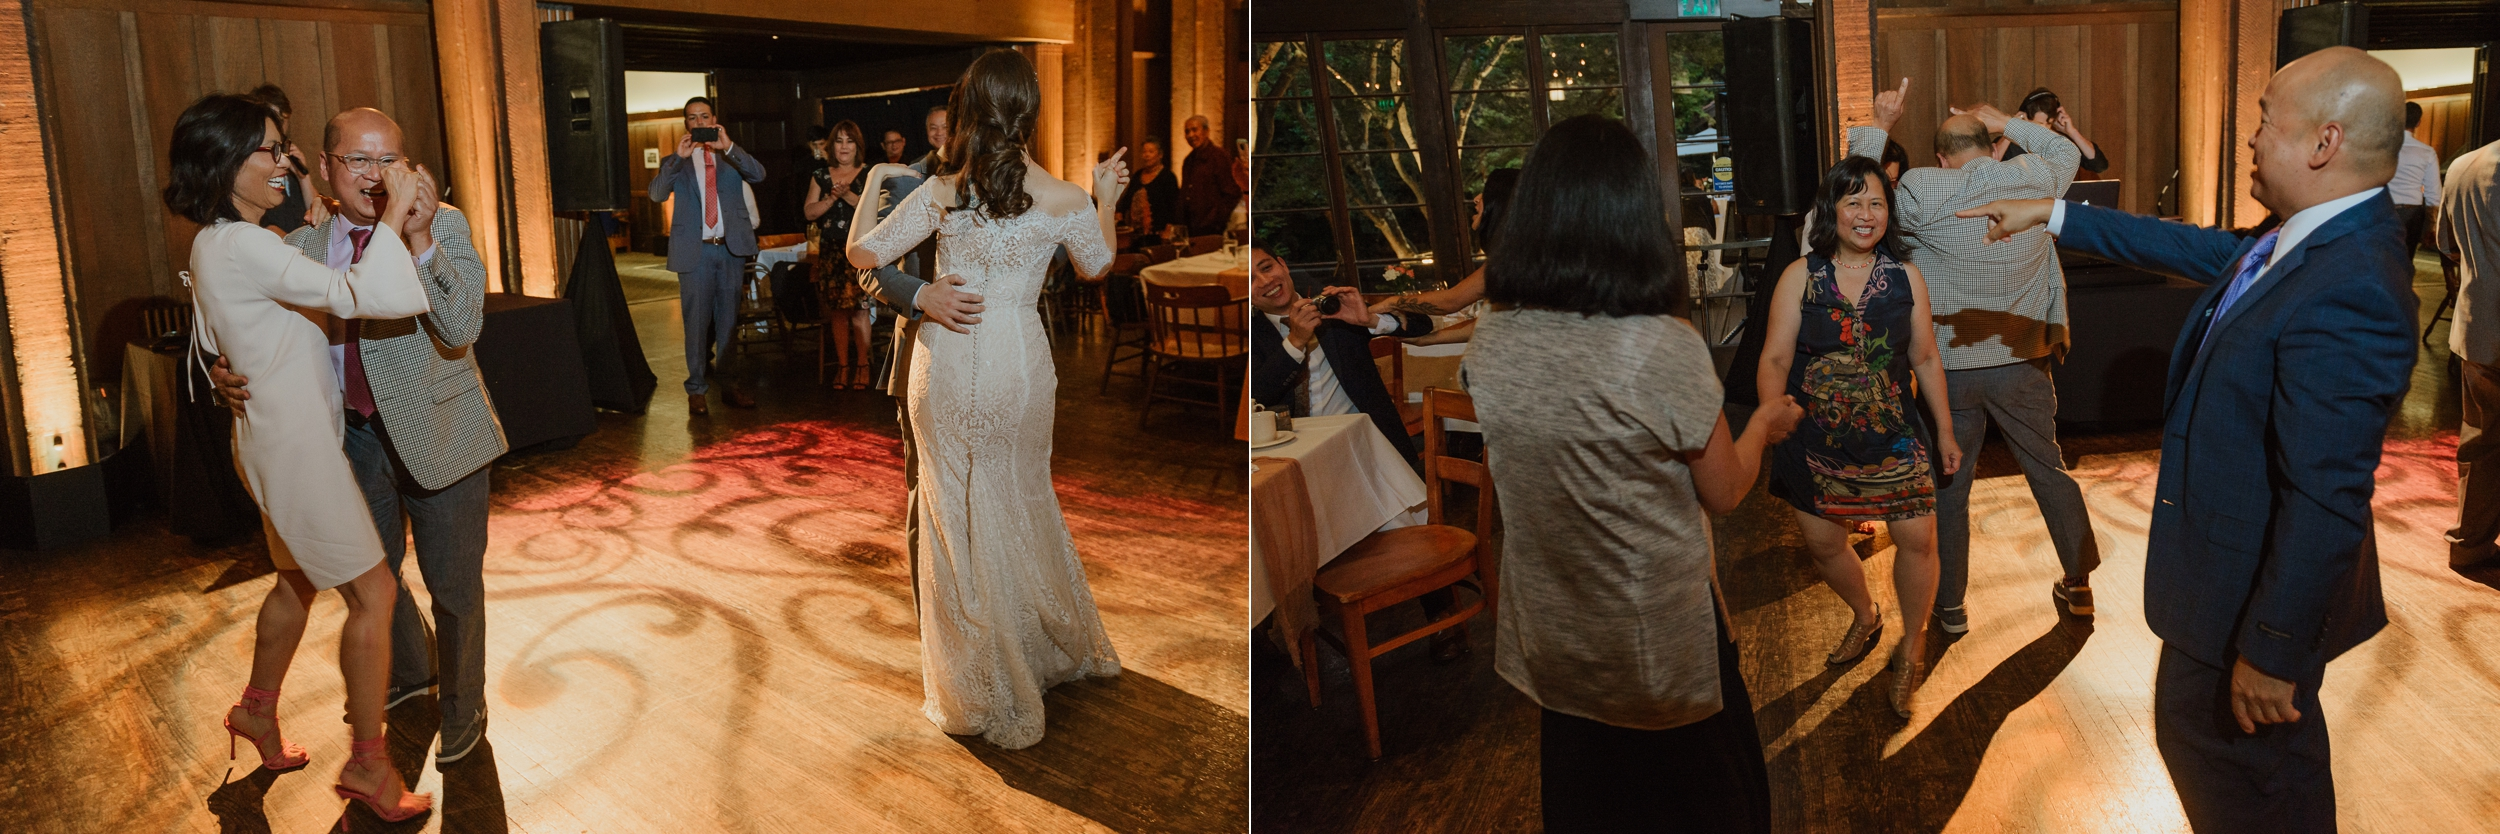 76-berkeley-uc-faculty-club-wedding-kb-vivianchen-474_WEB.jpg